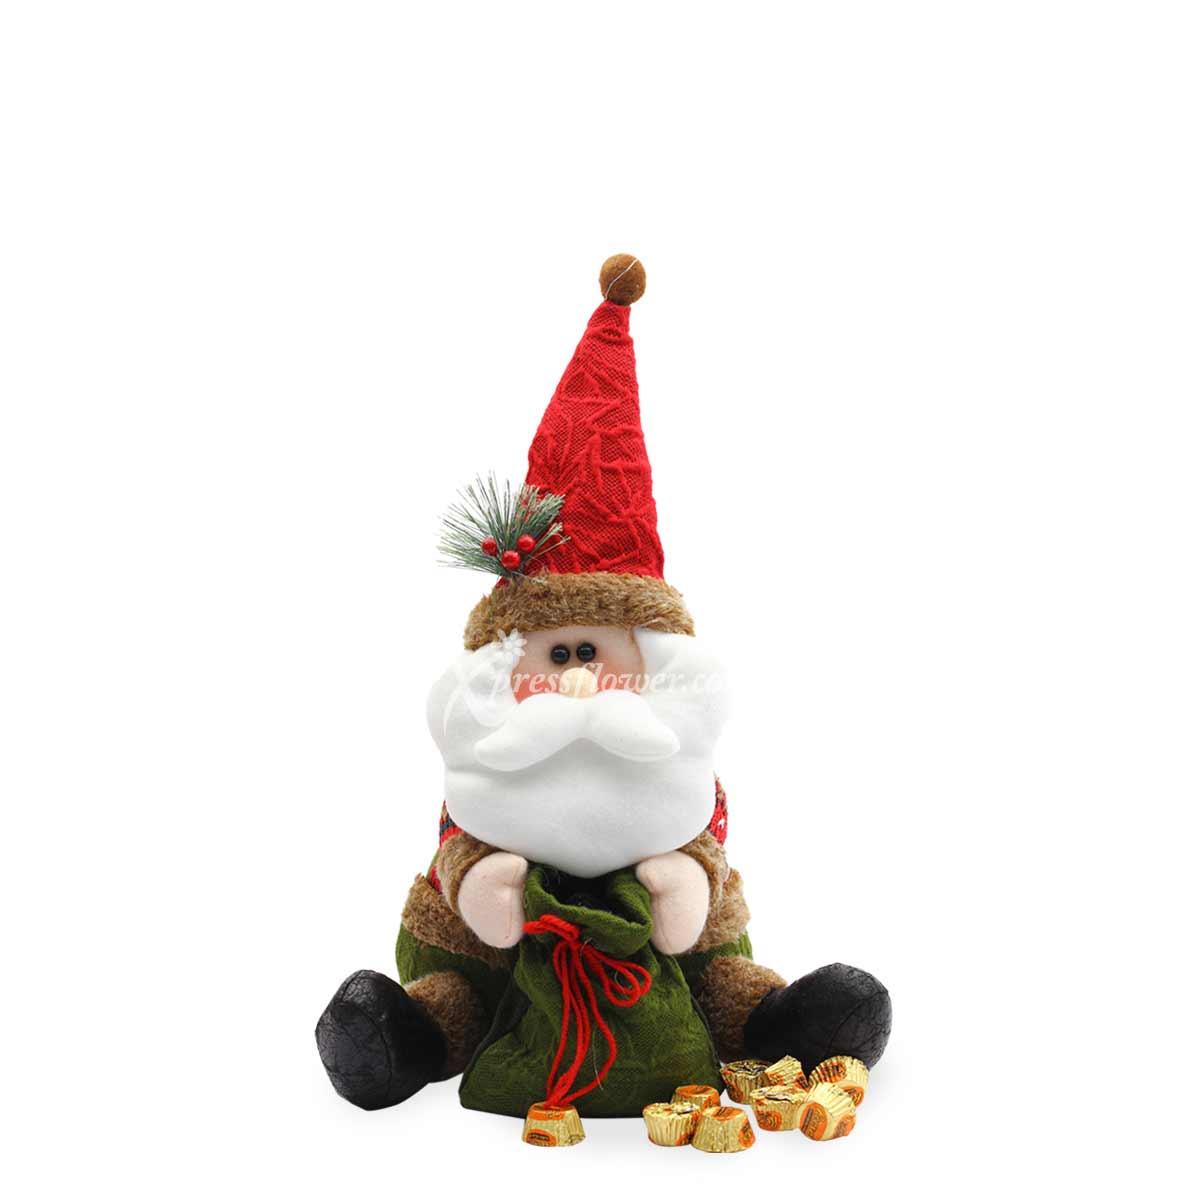 XMM1982 Santas Sugar Treats flower and gift